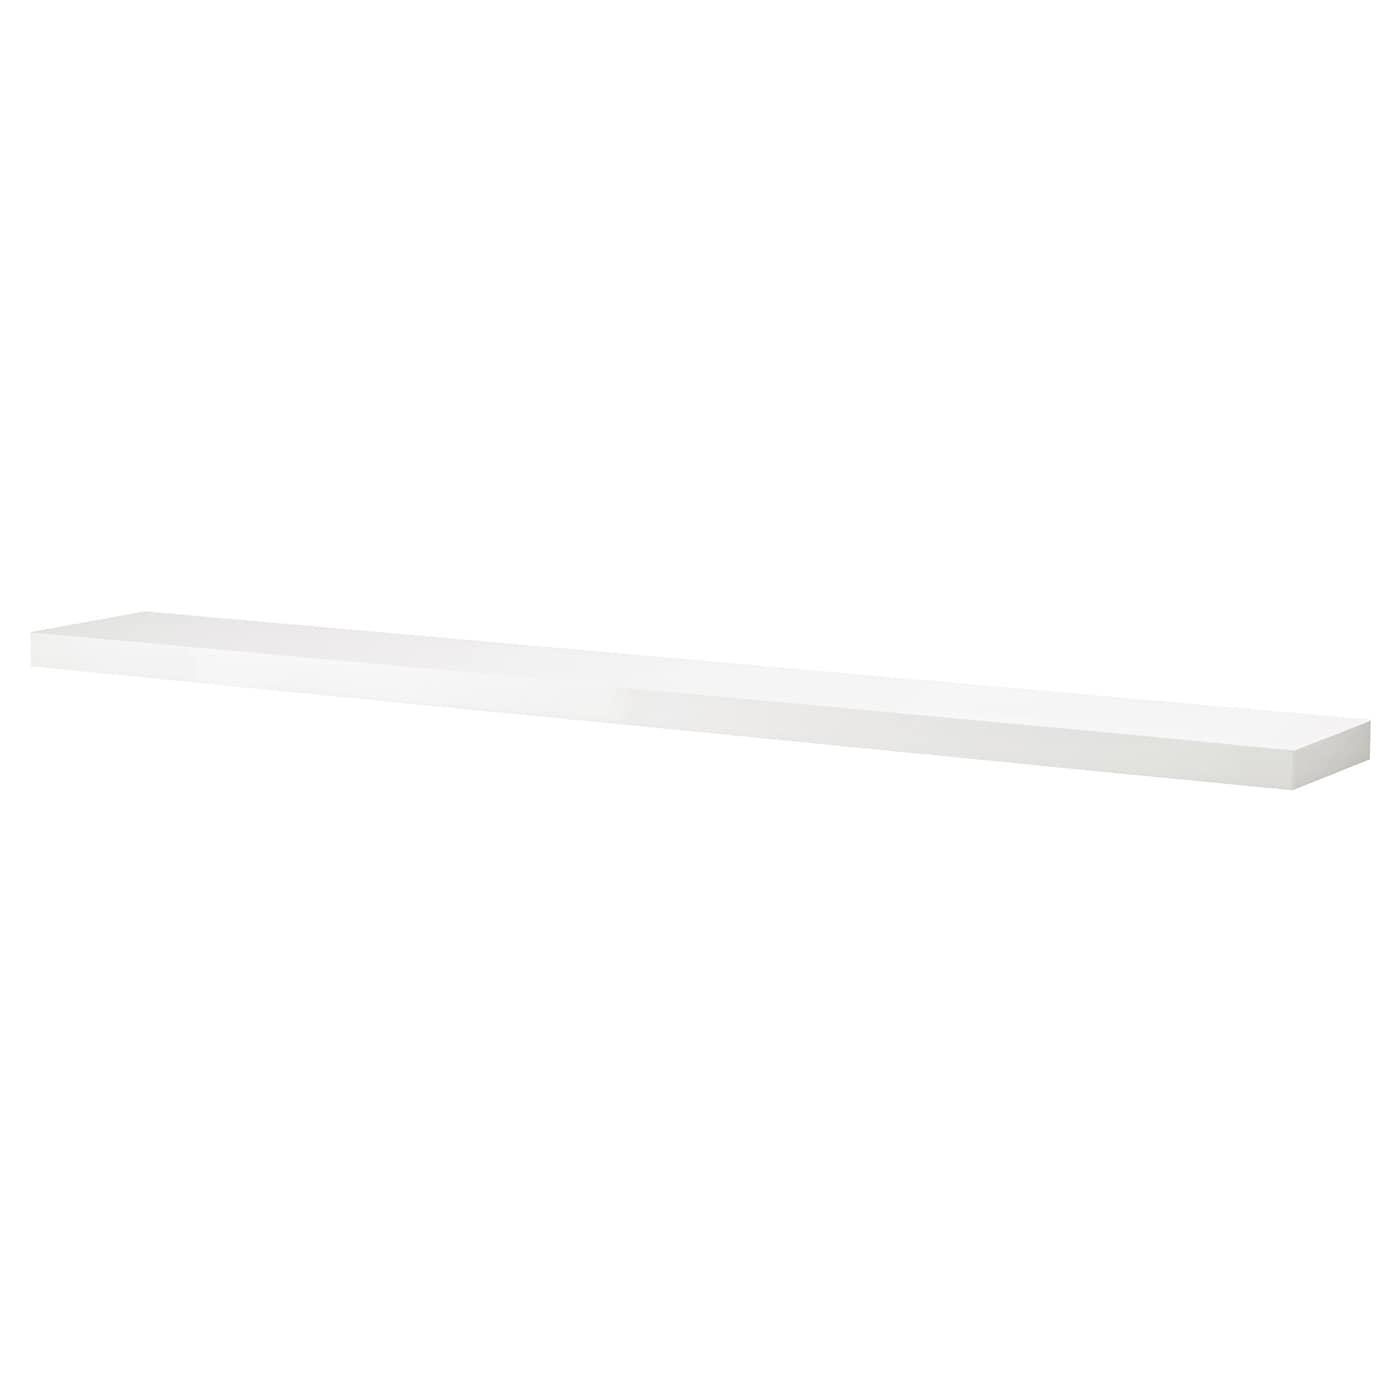 LACK Wall Shelf White/high-gloss 190 X 26 Cm